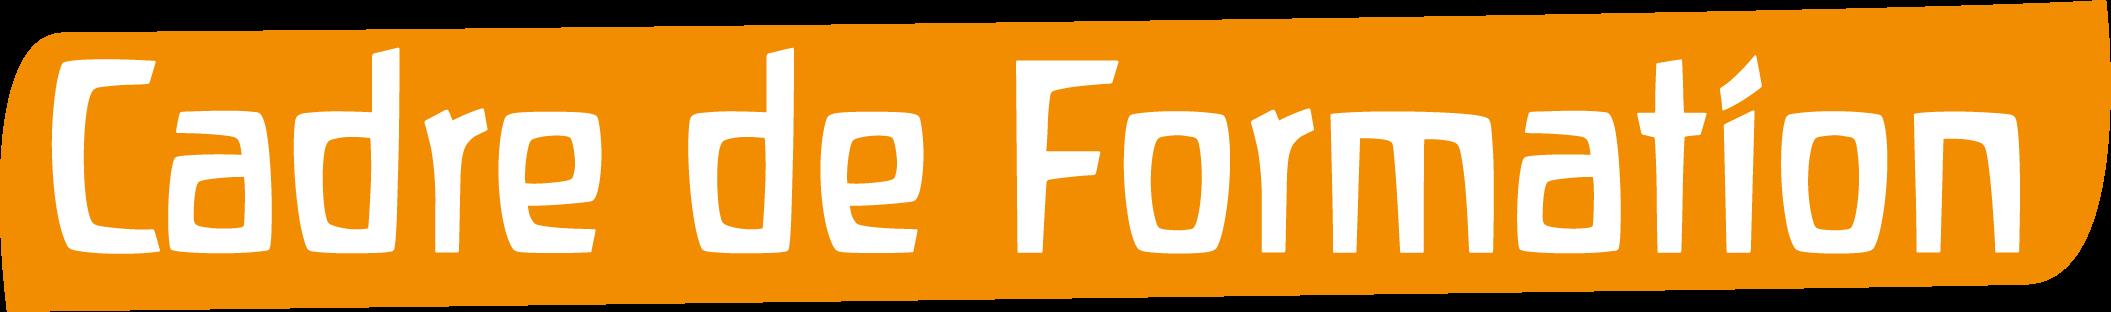 Cadre de Formation